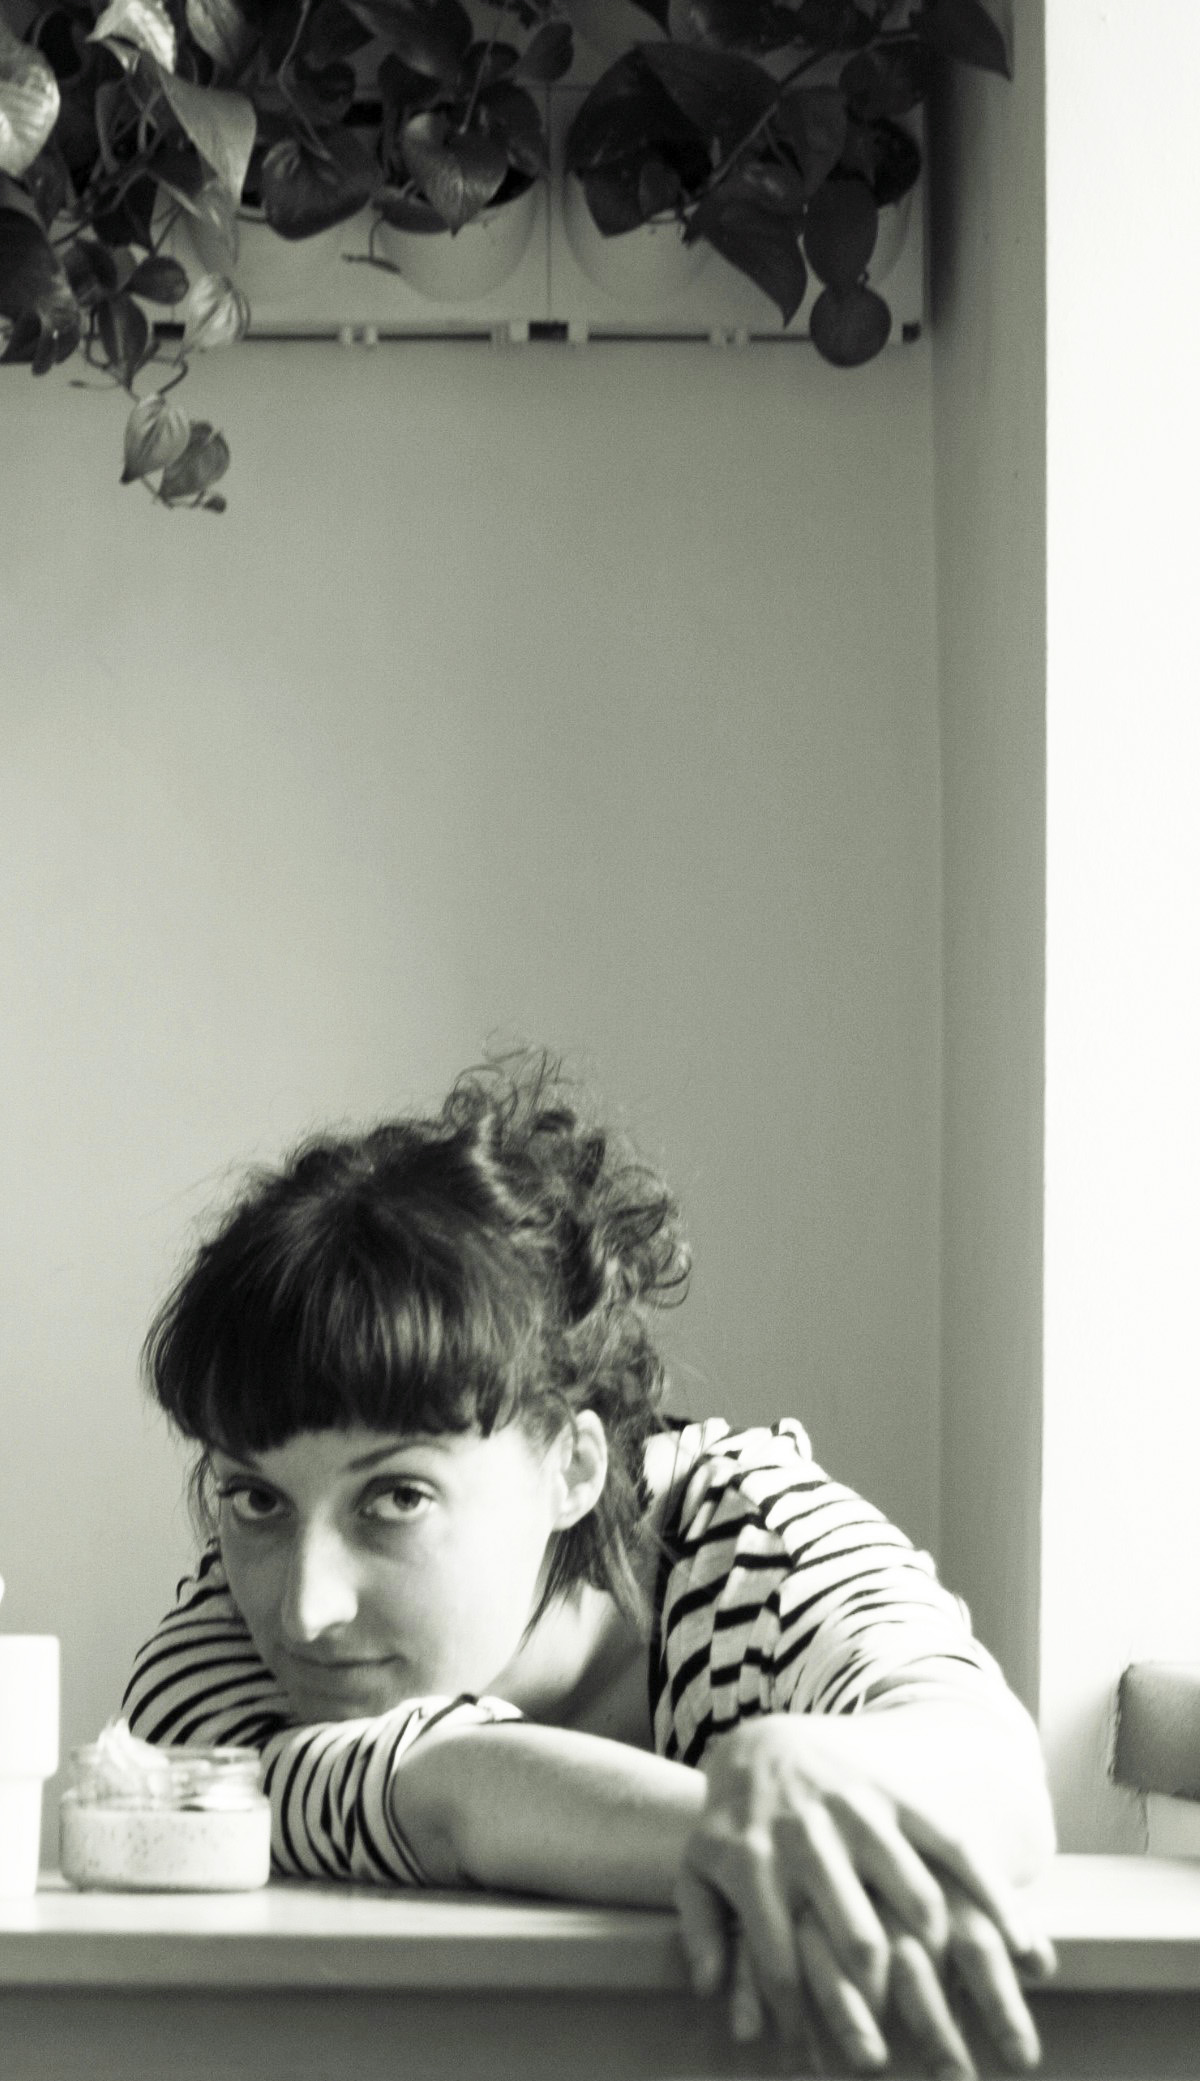 Izabela Wisniewska